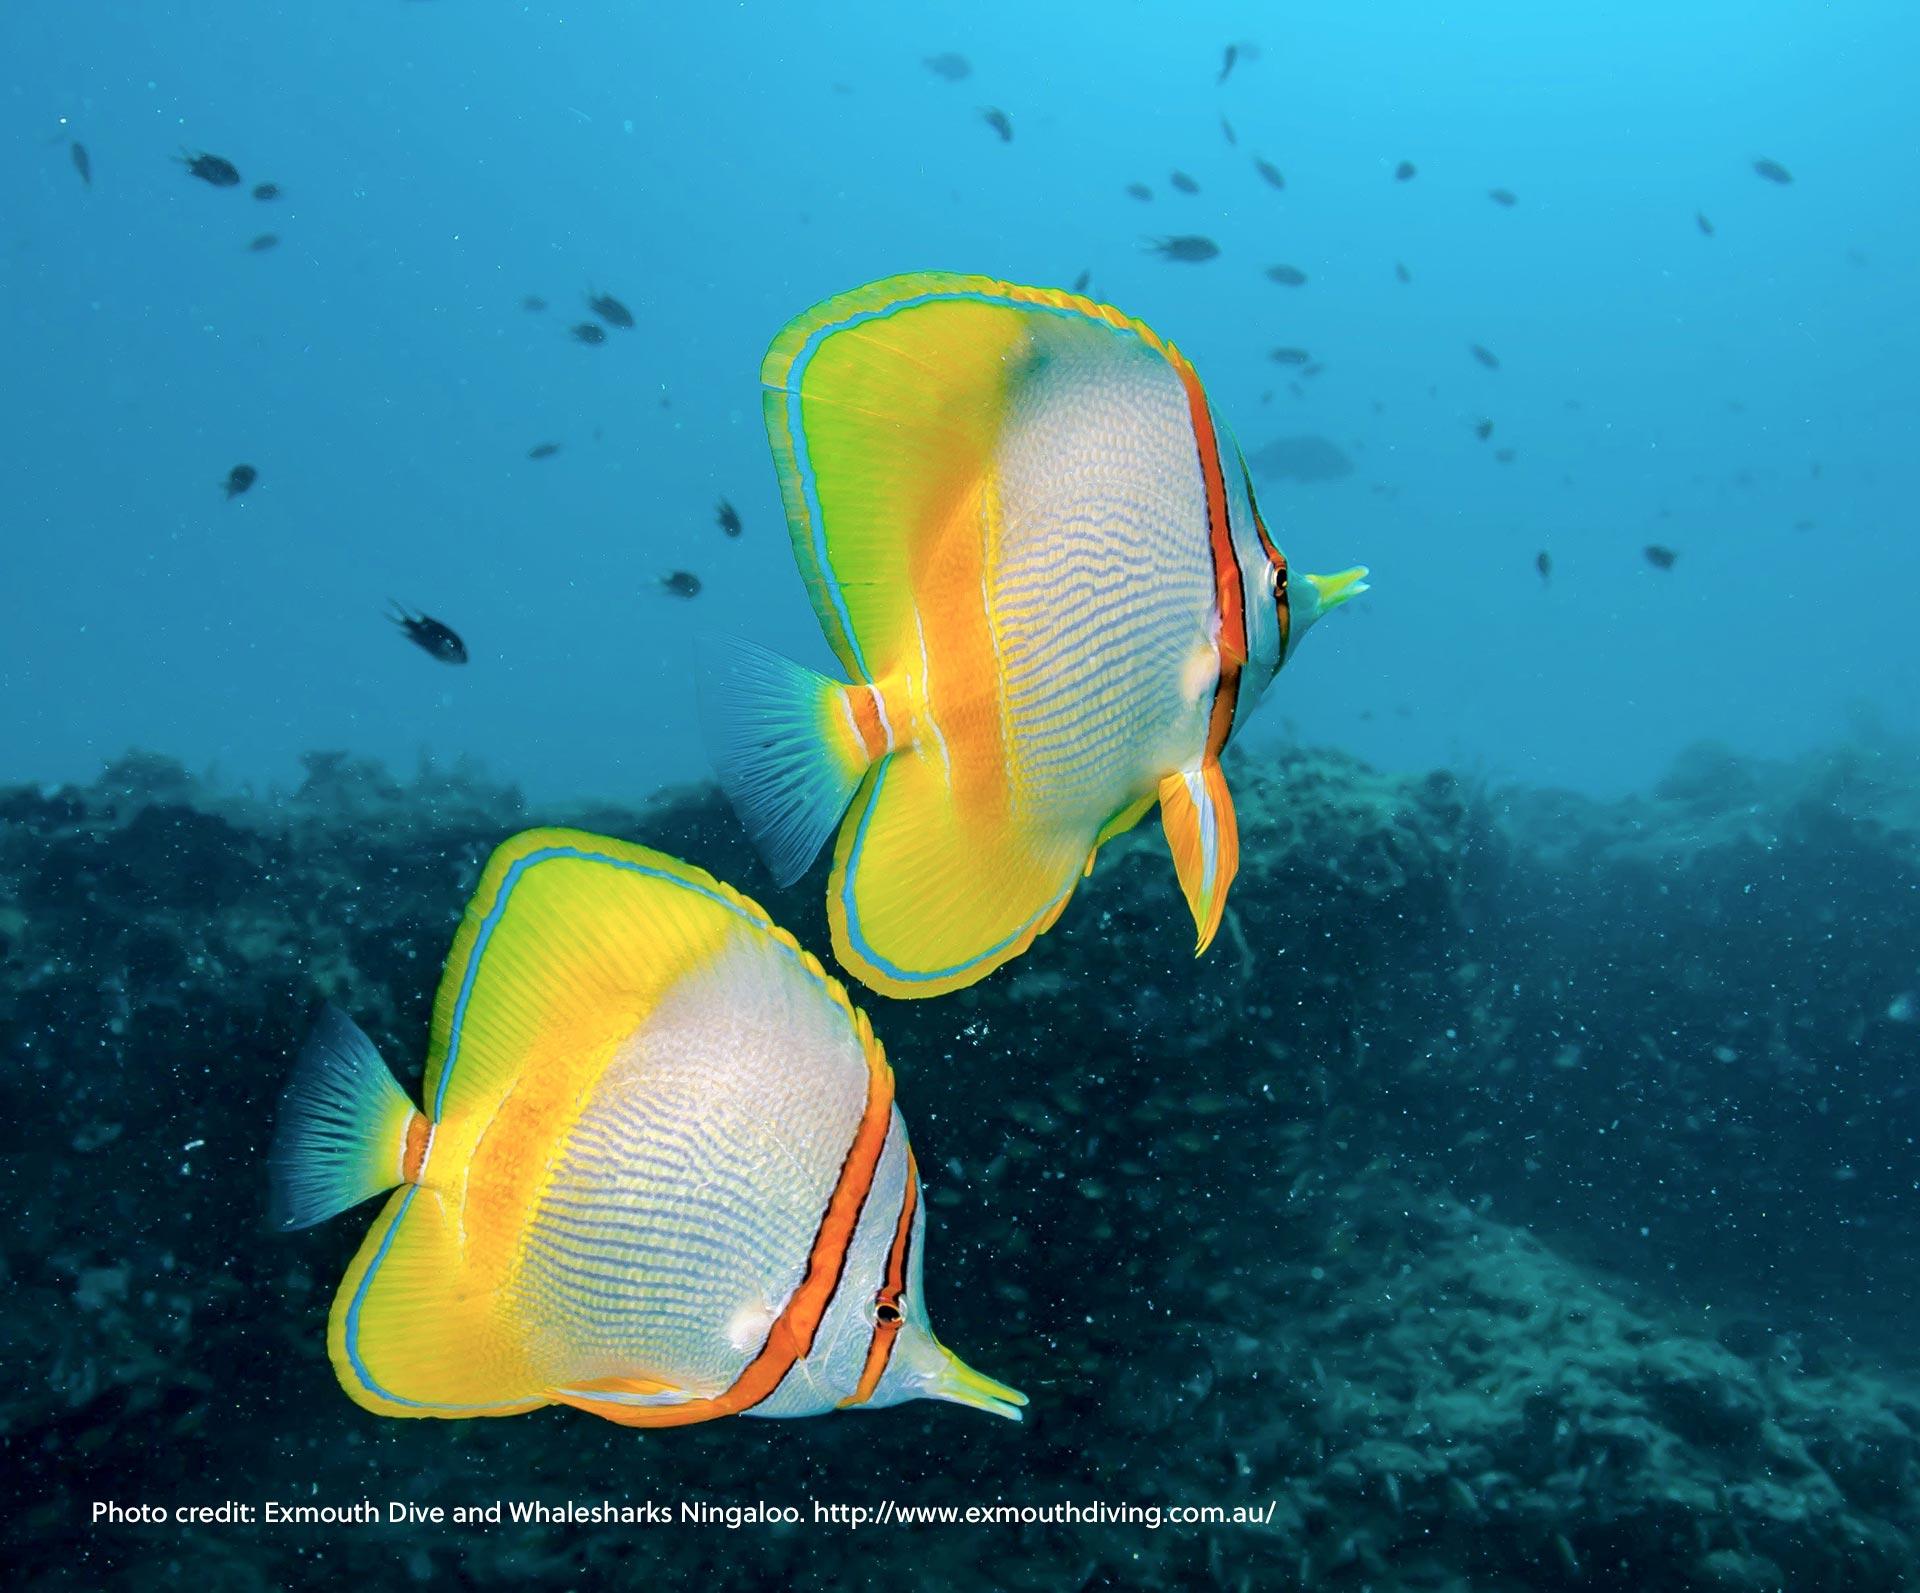 Colourful Fish at Ningaloo Marine Park, Western Australia